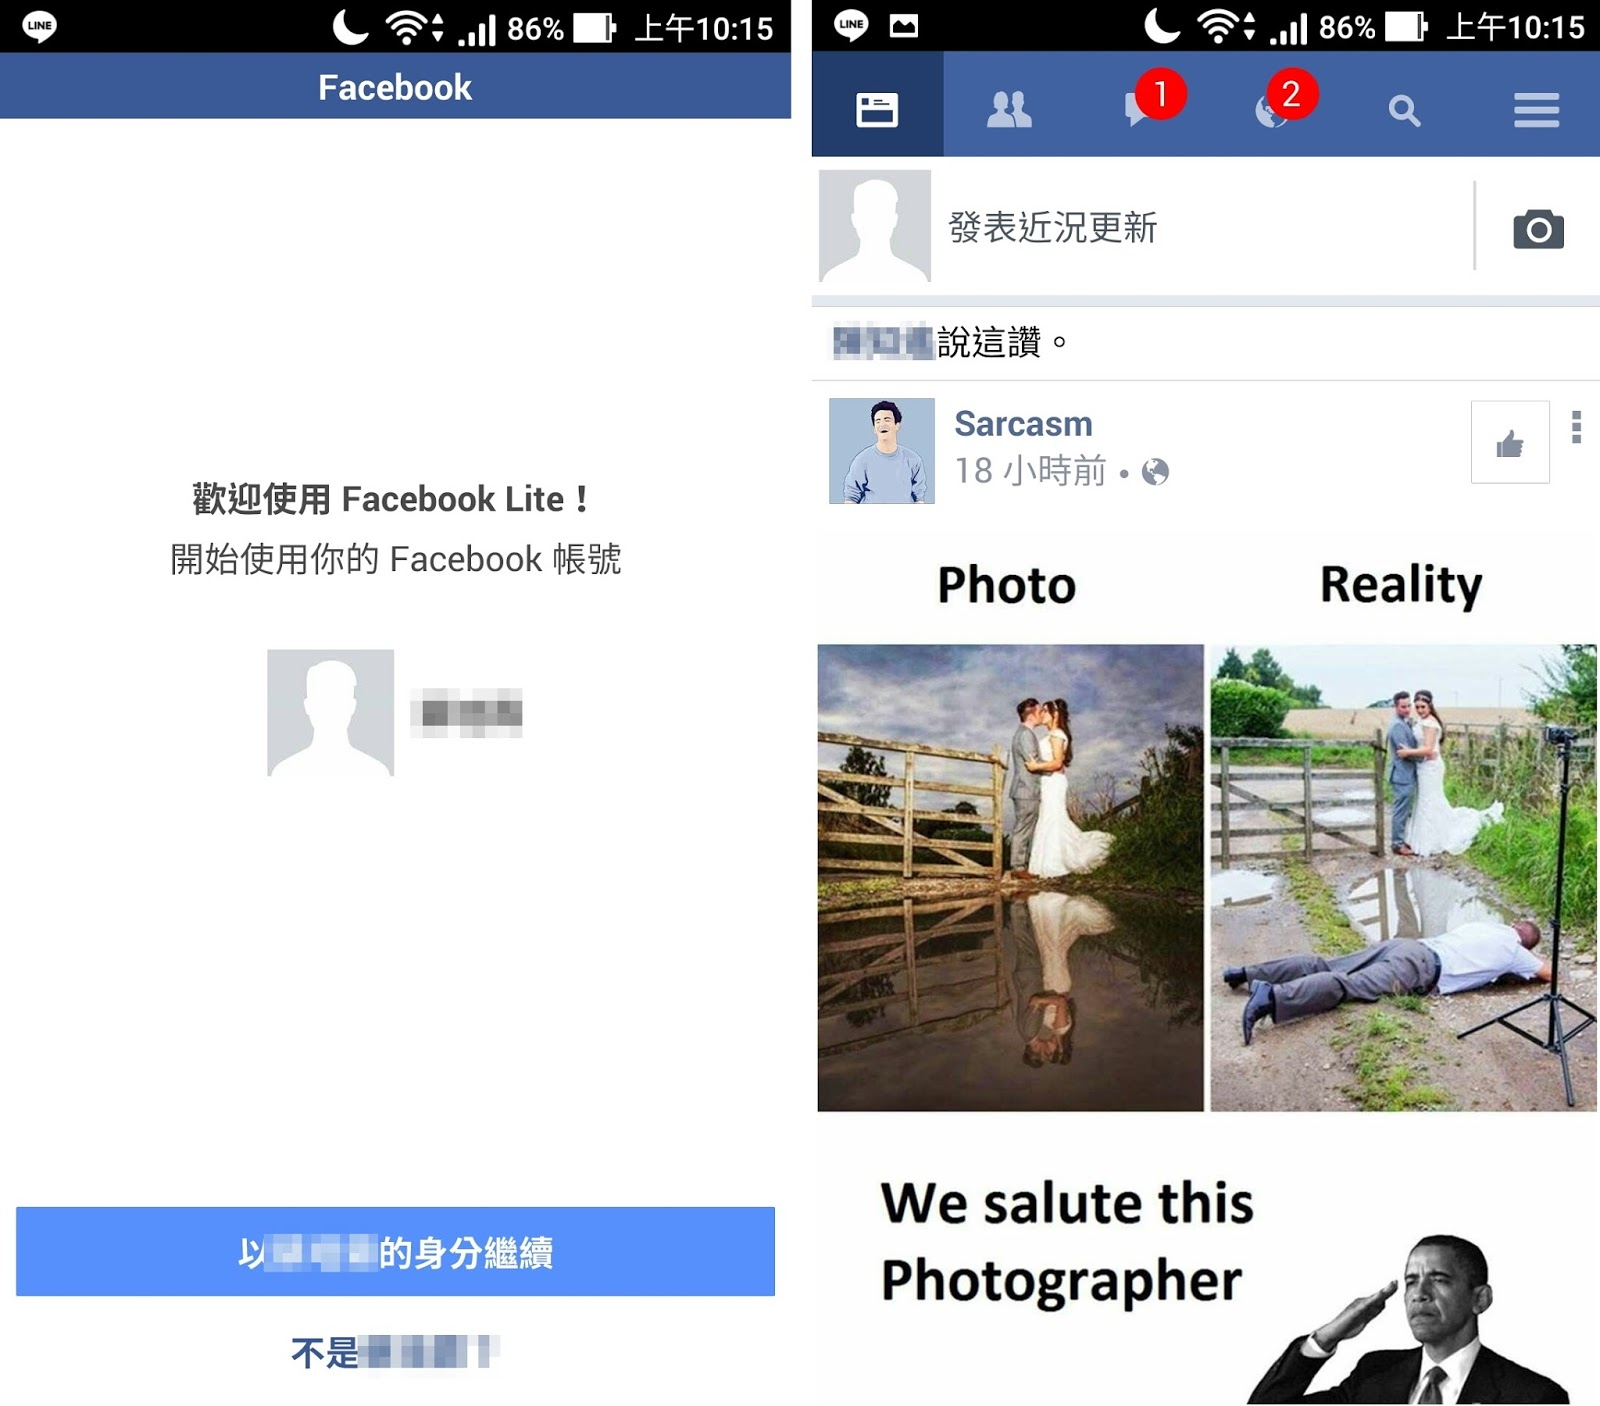 Screenshot 20170603 101542 - Facebook Lite - 官方推出的輕量版臉書App,超省流量及系統資源、把你用不到的功能給去掉!